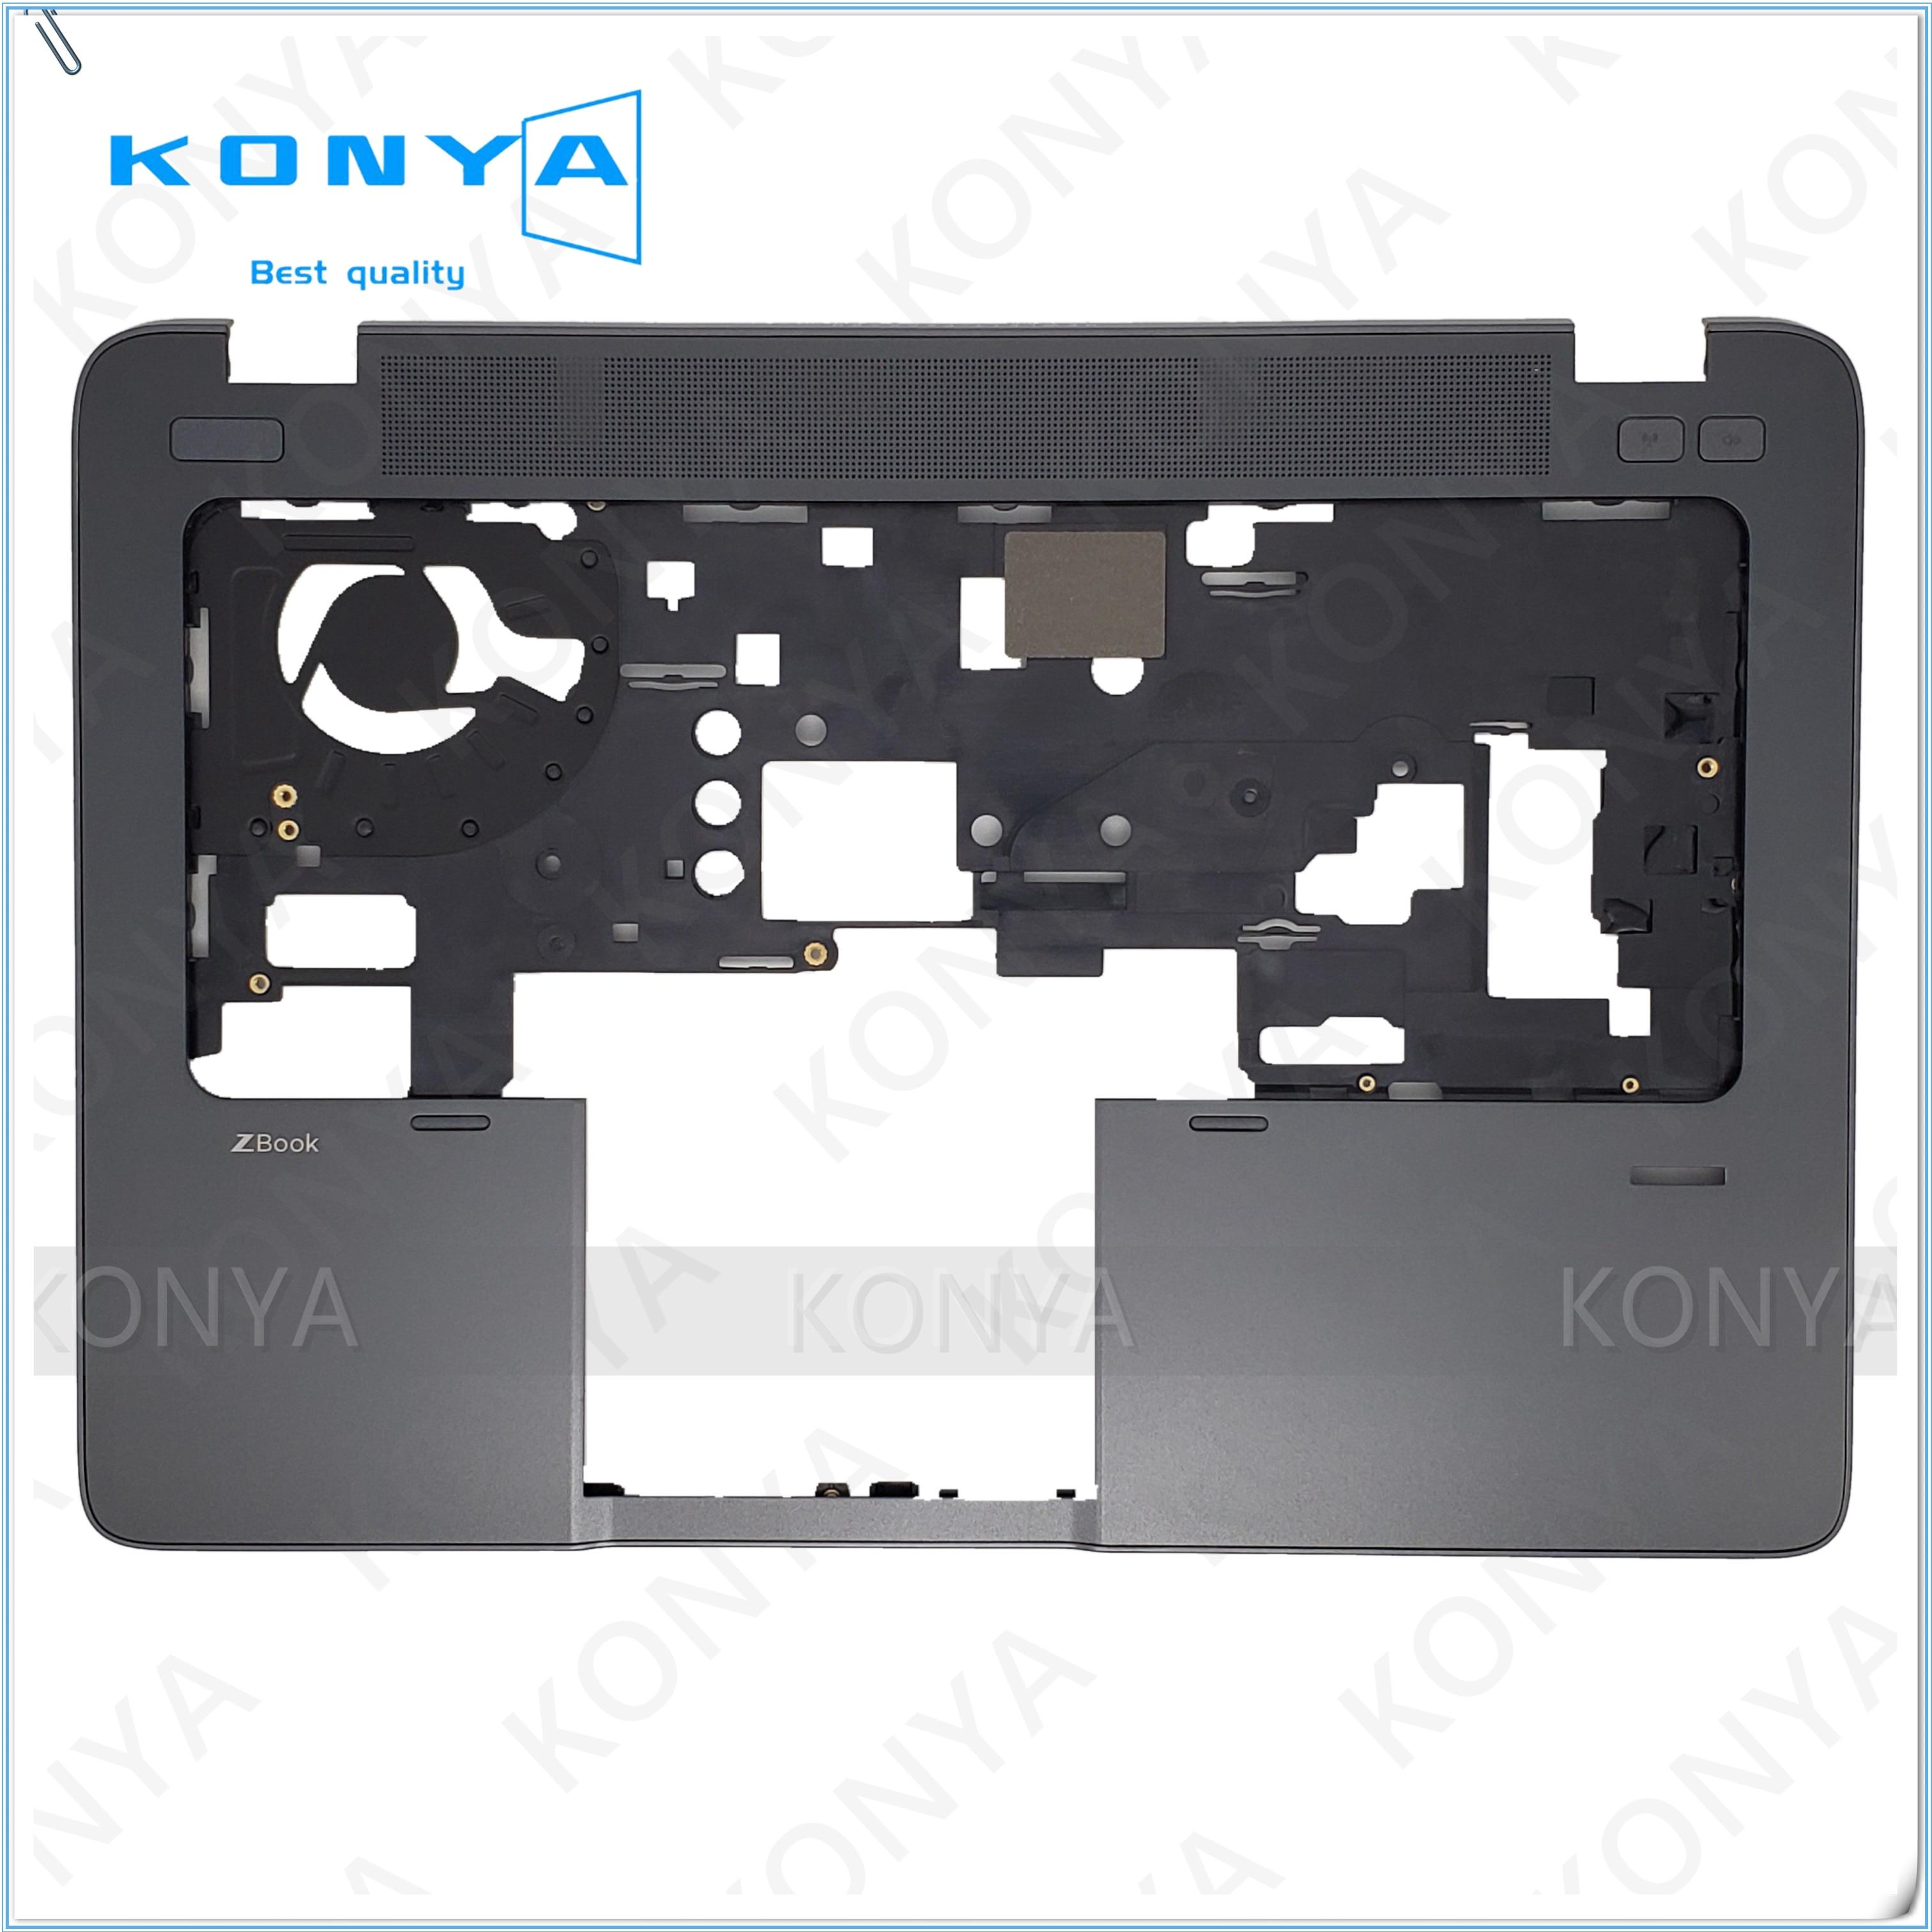 Nuevo Original para HP Zbook 14 G1 G2 funda superior para ordenador portátil 730965-001 palcubierta superior para reposacabezas